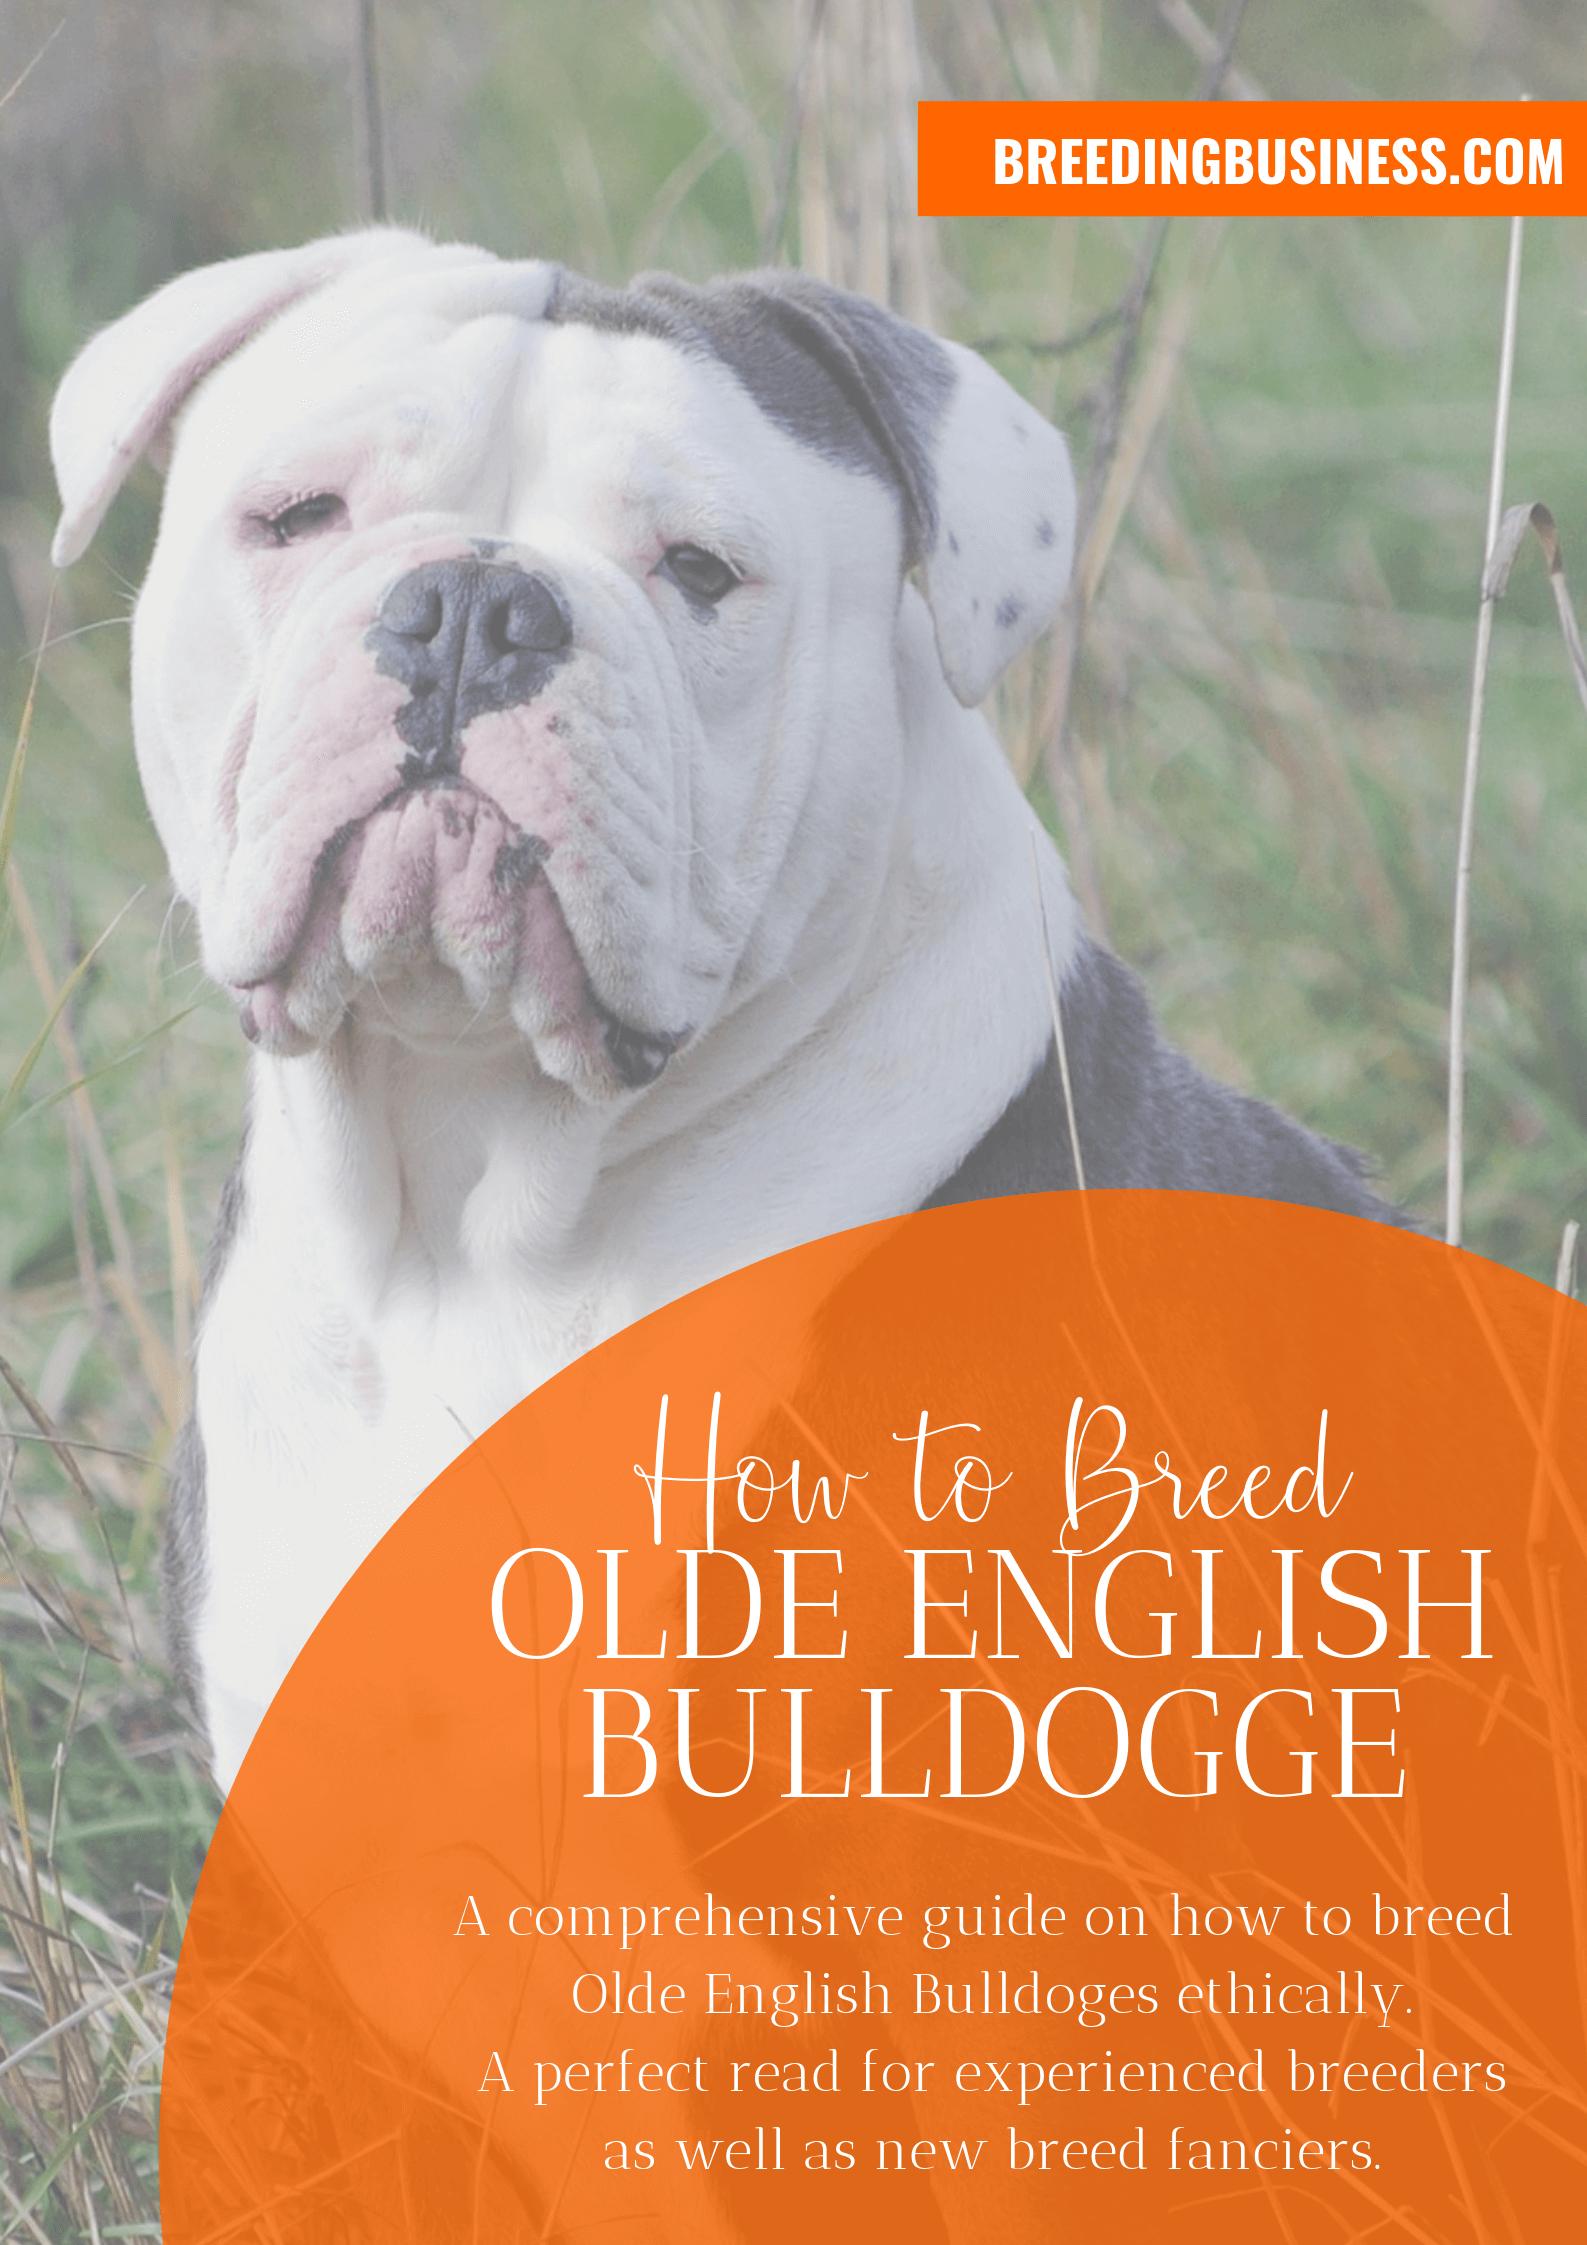 breeding Olde English Bulldogges